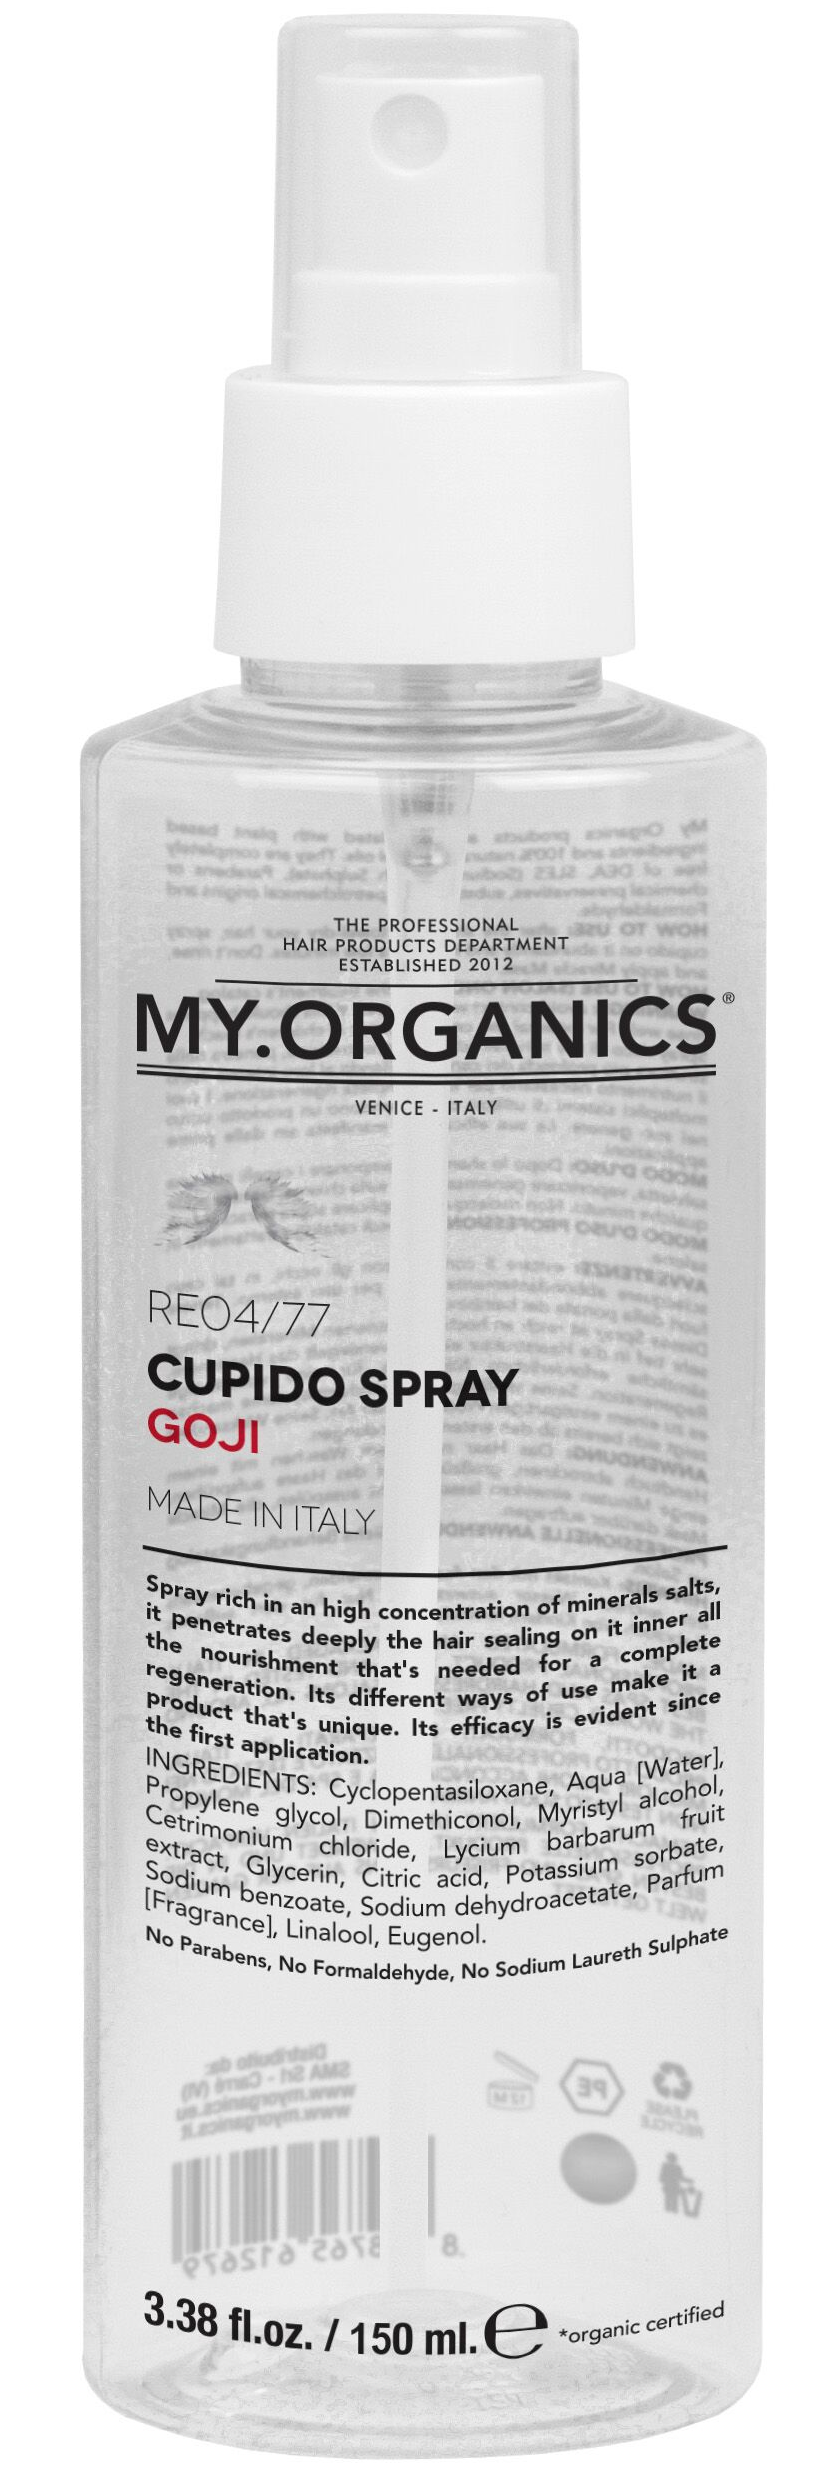 MY.ORGANICS Cupido Spray Goji 150ml